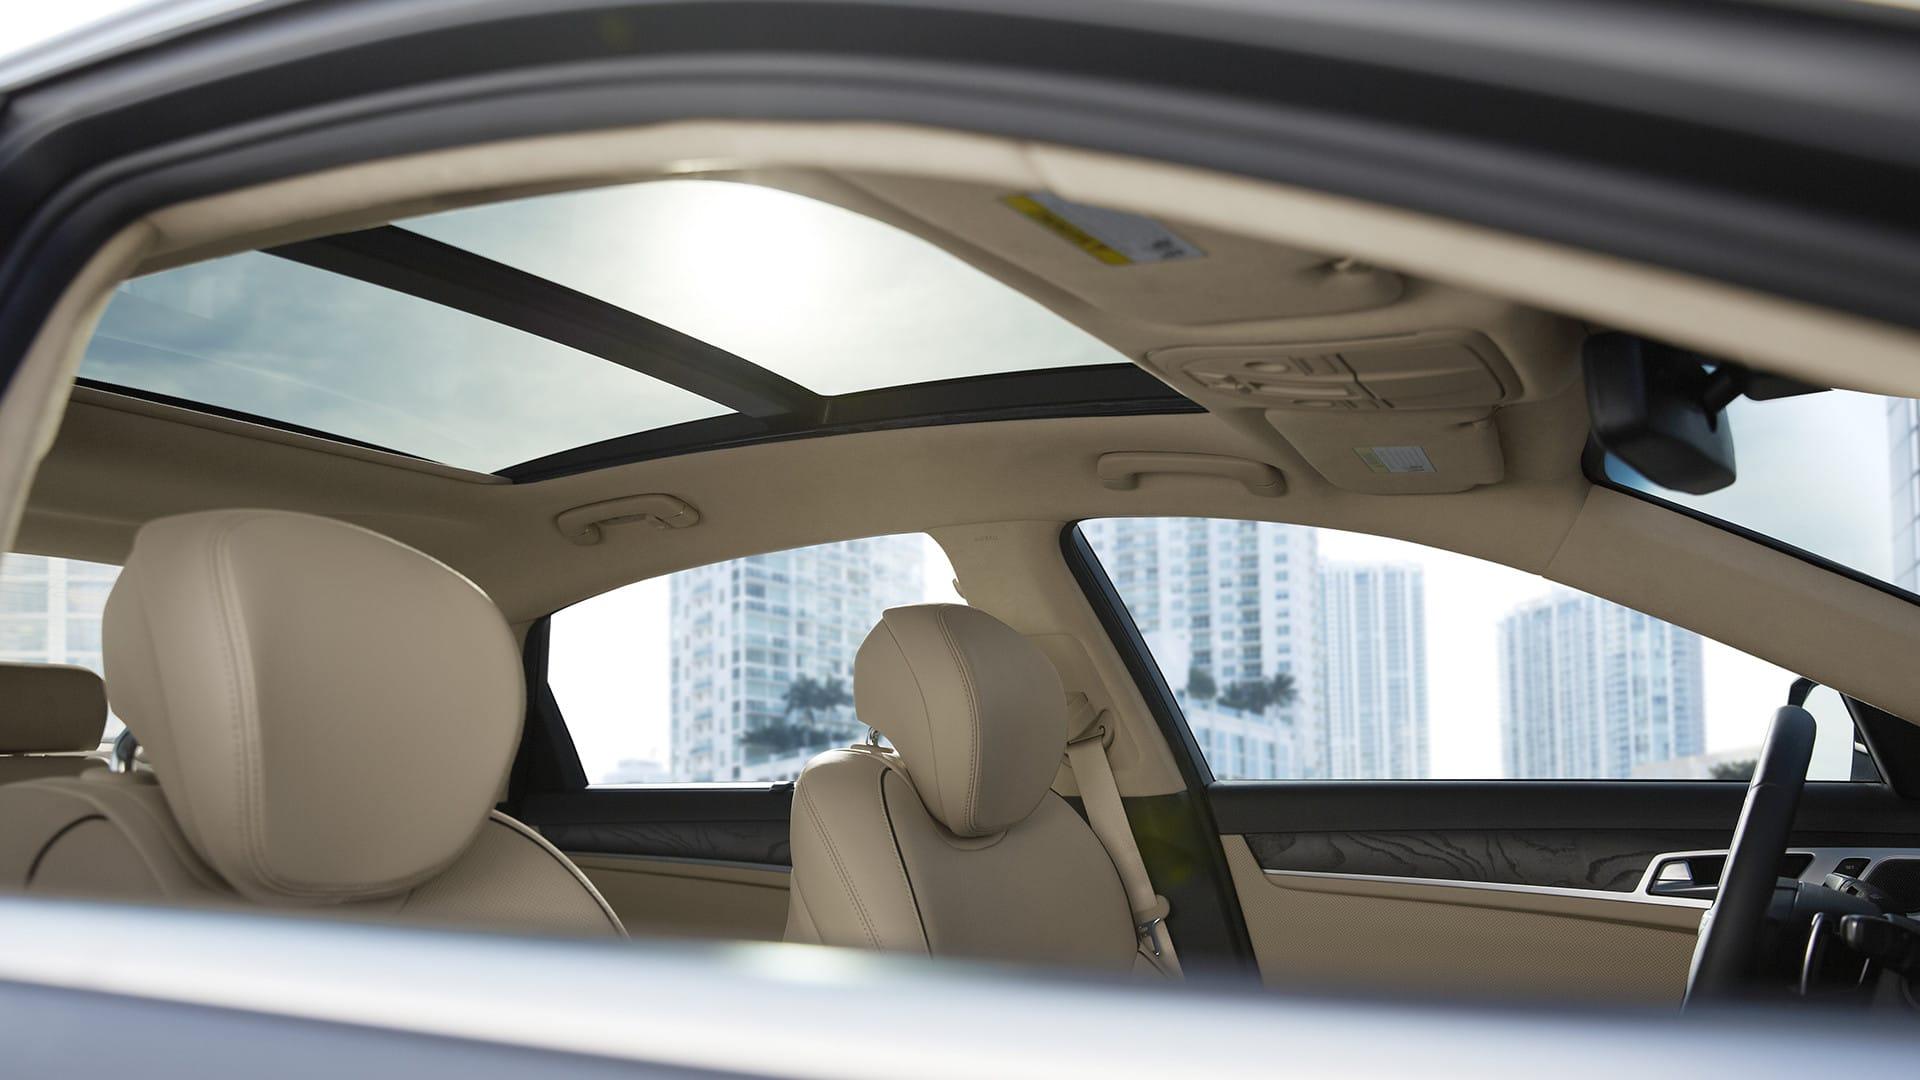 how to change windshield wipers on hyundai genesis